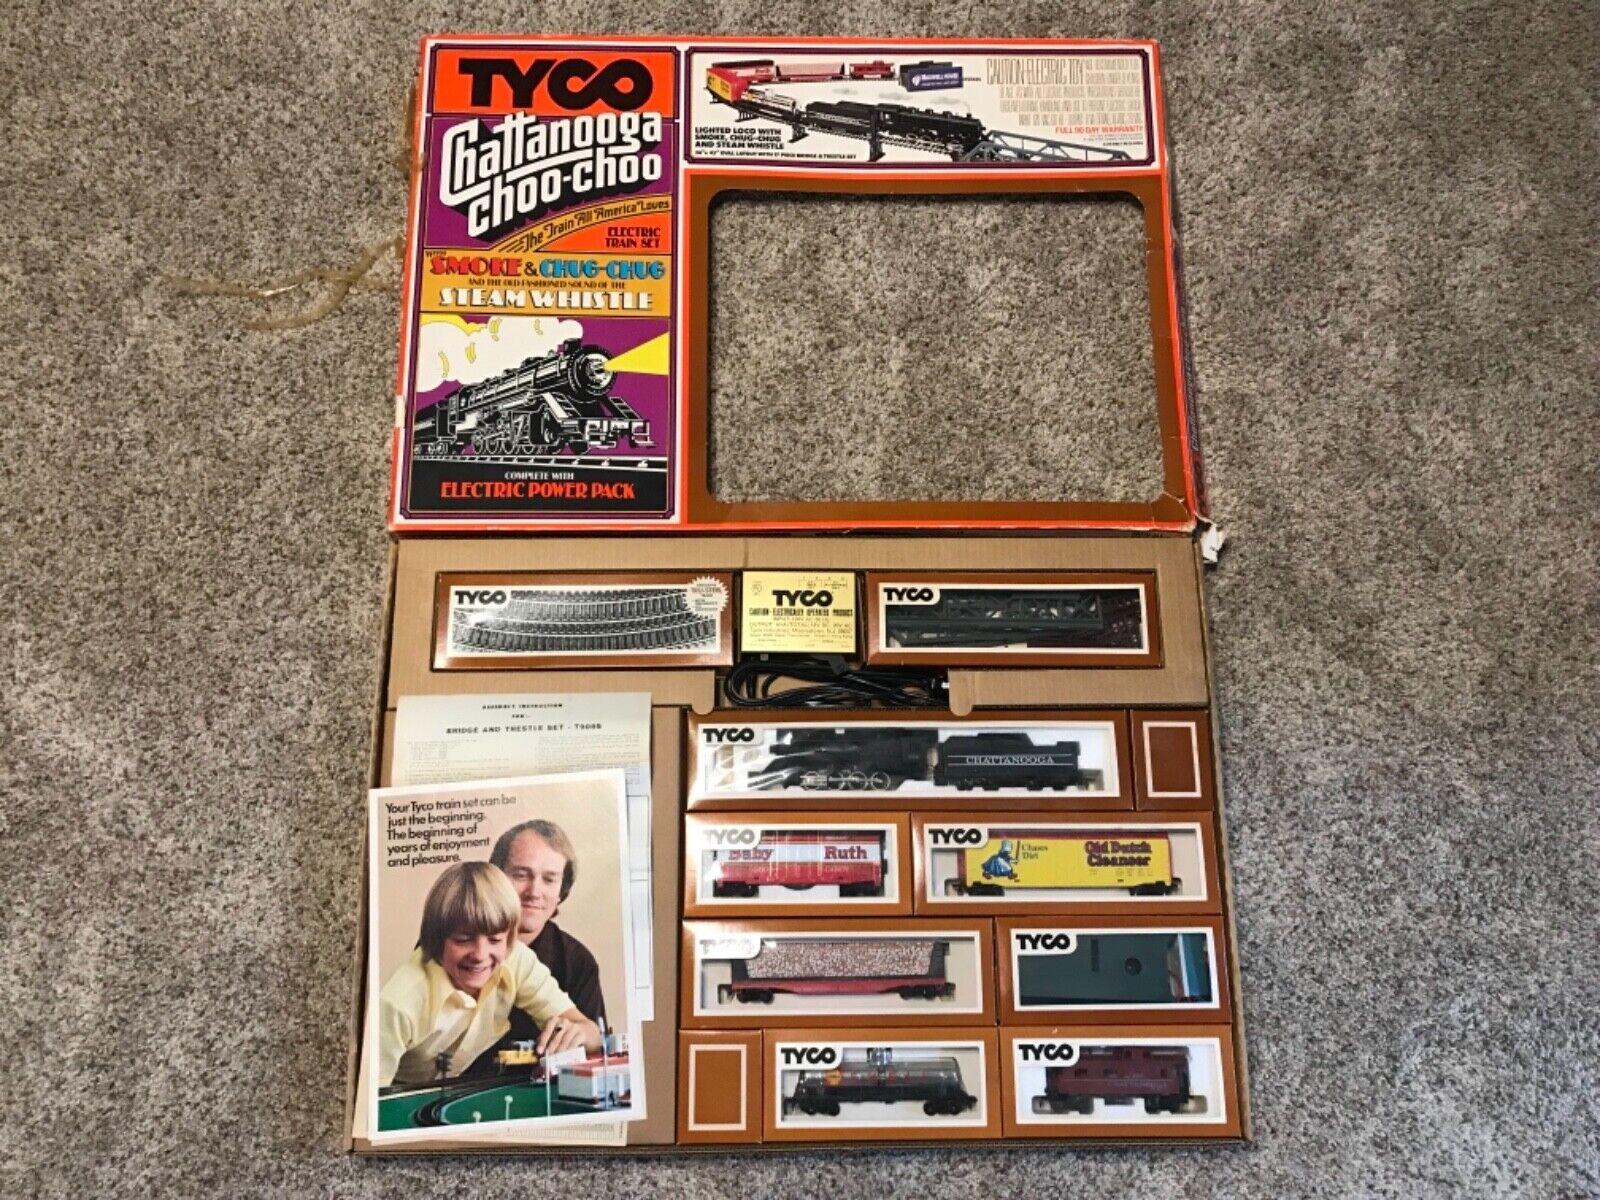 Tyco Chattanooga Choo Choo Train Set w  Smoke and Steam Whistle in Box